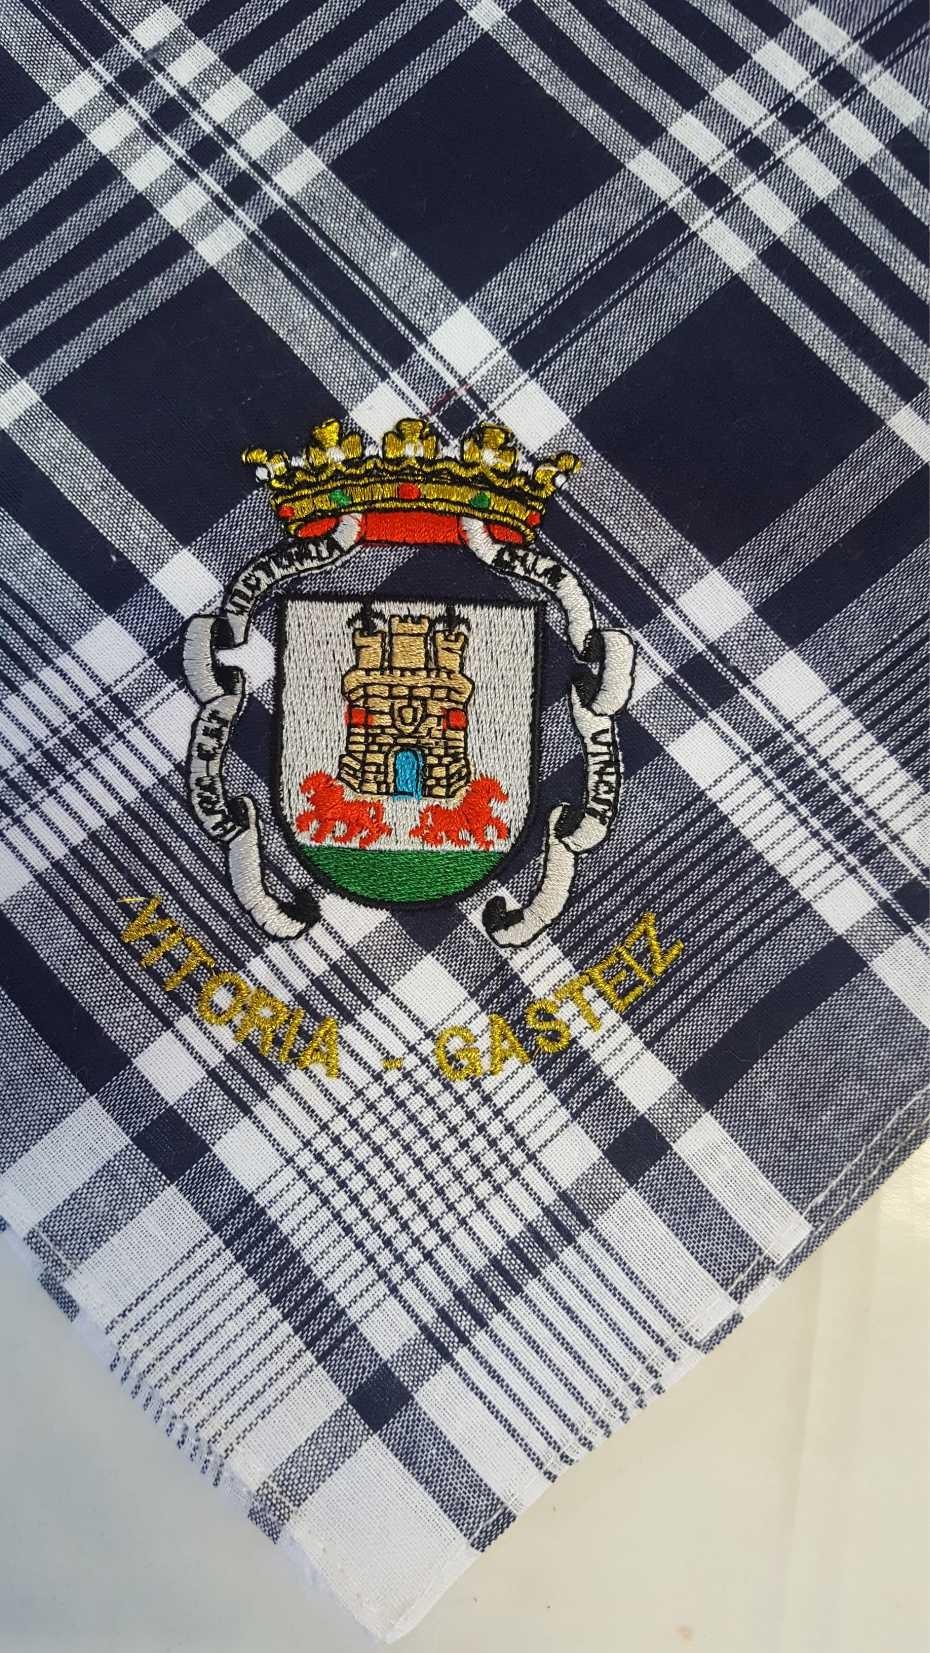 Vitoria - Gasteiz